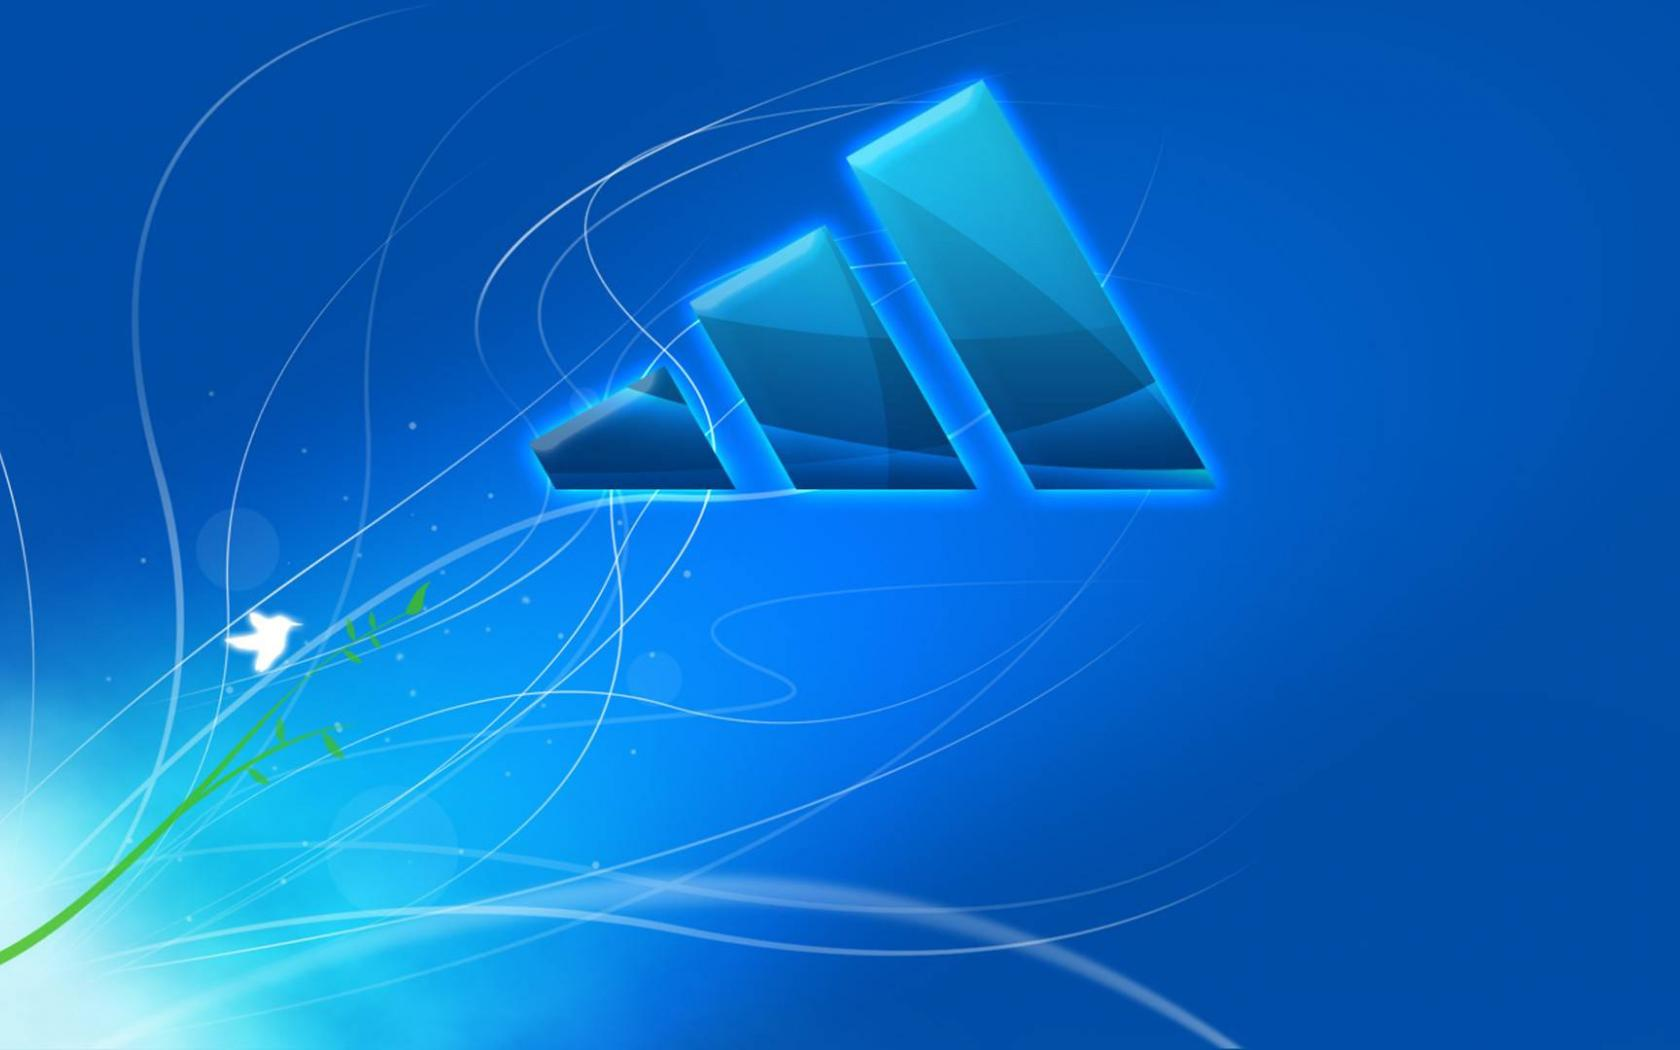 Windows seven wallpaper [10] HQ WALLPAPER   23420 1680x1050